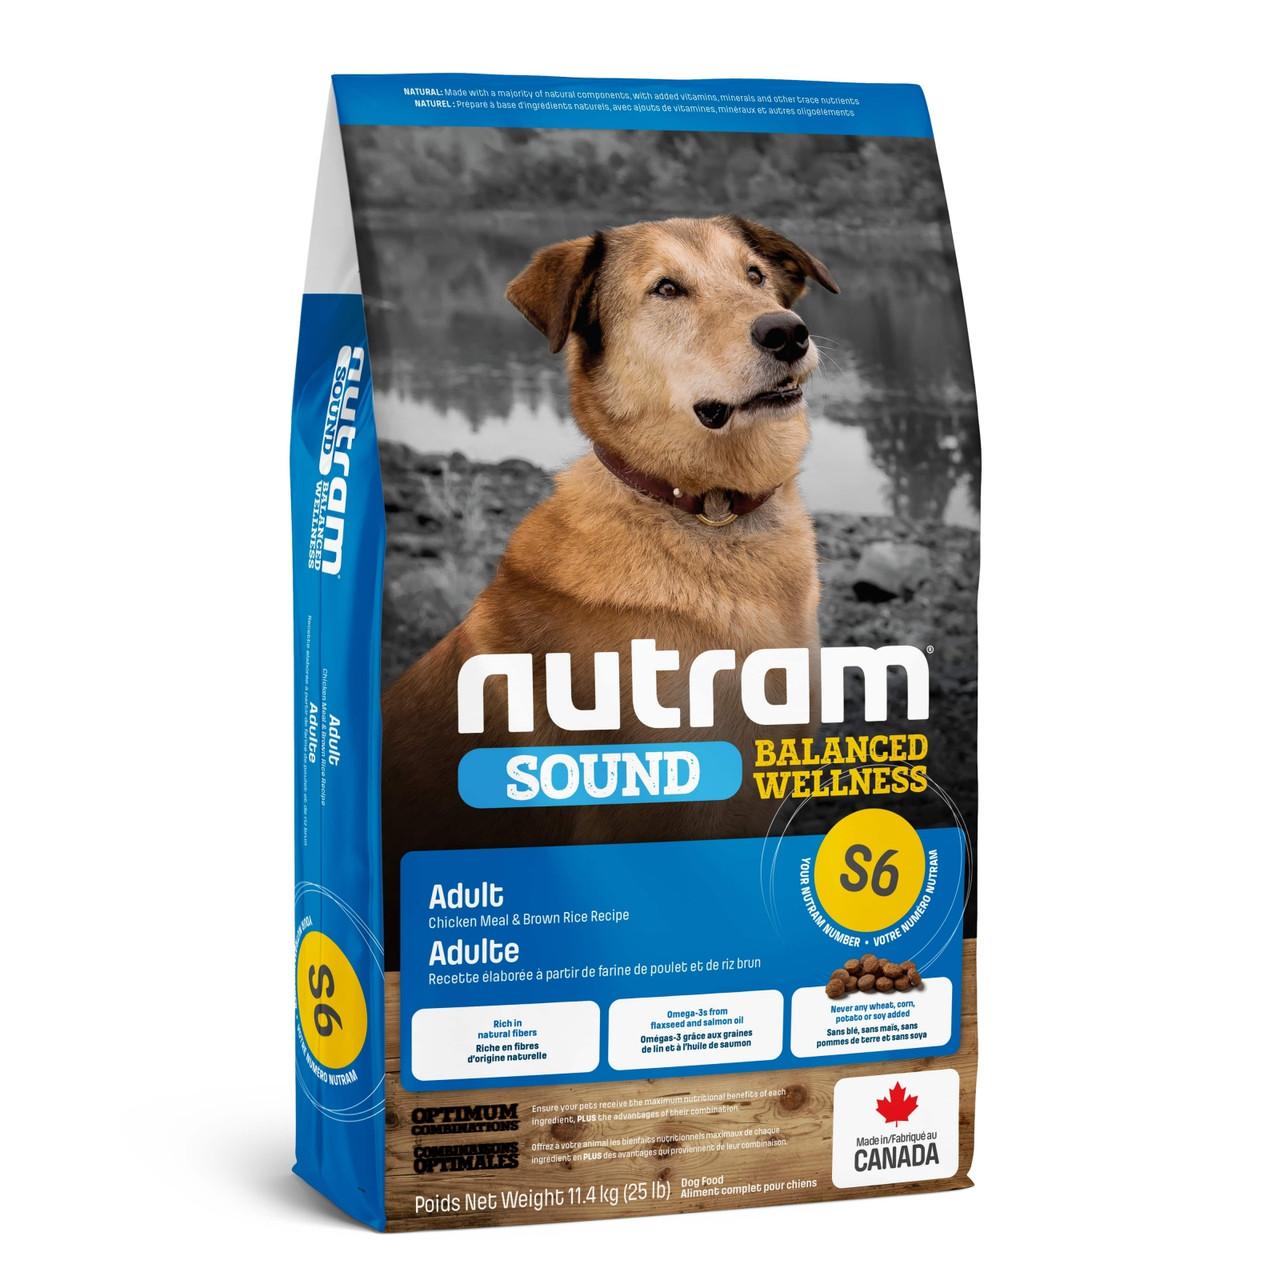 Nutram (Нутрам) S6 Sound Balanced Wellness Natural Adult сухой корм для взрослых собак, 2 кг